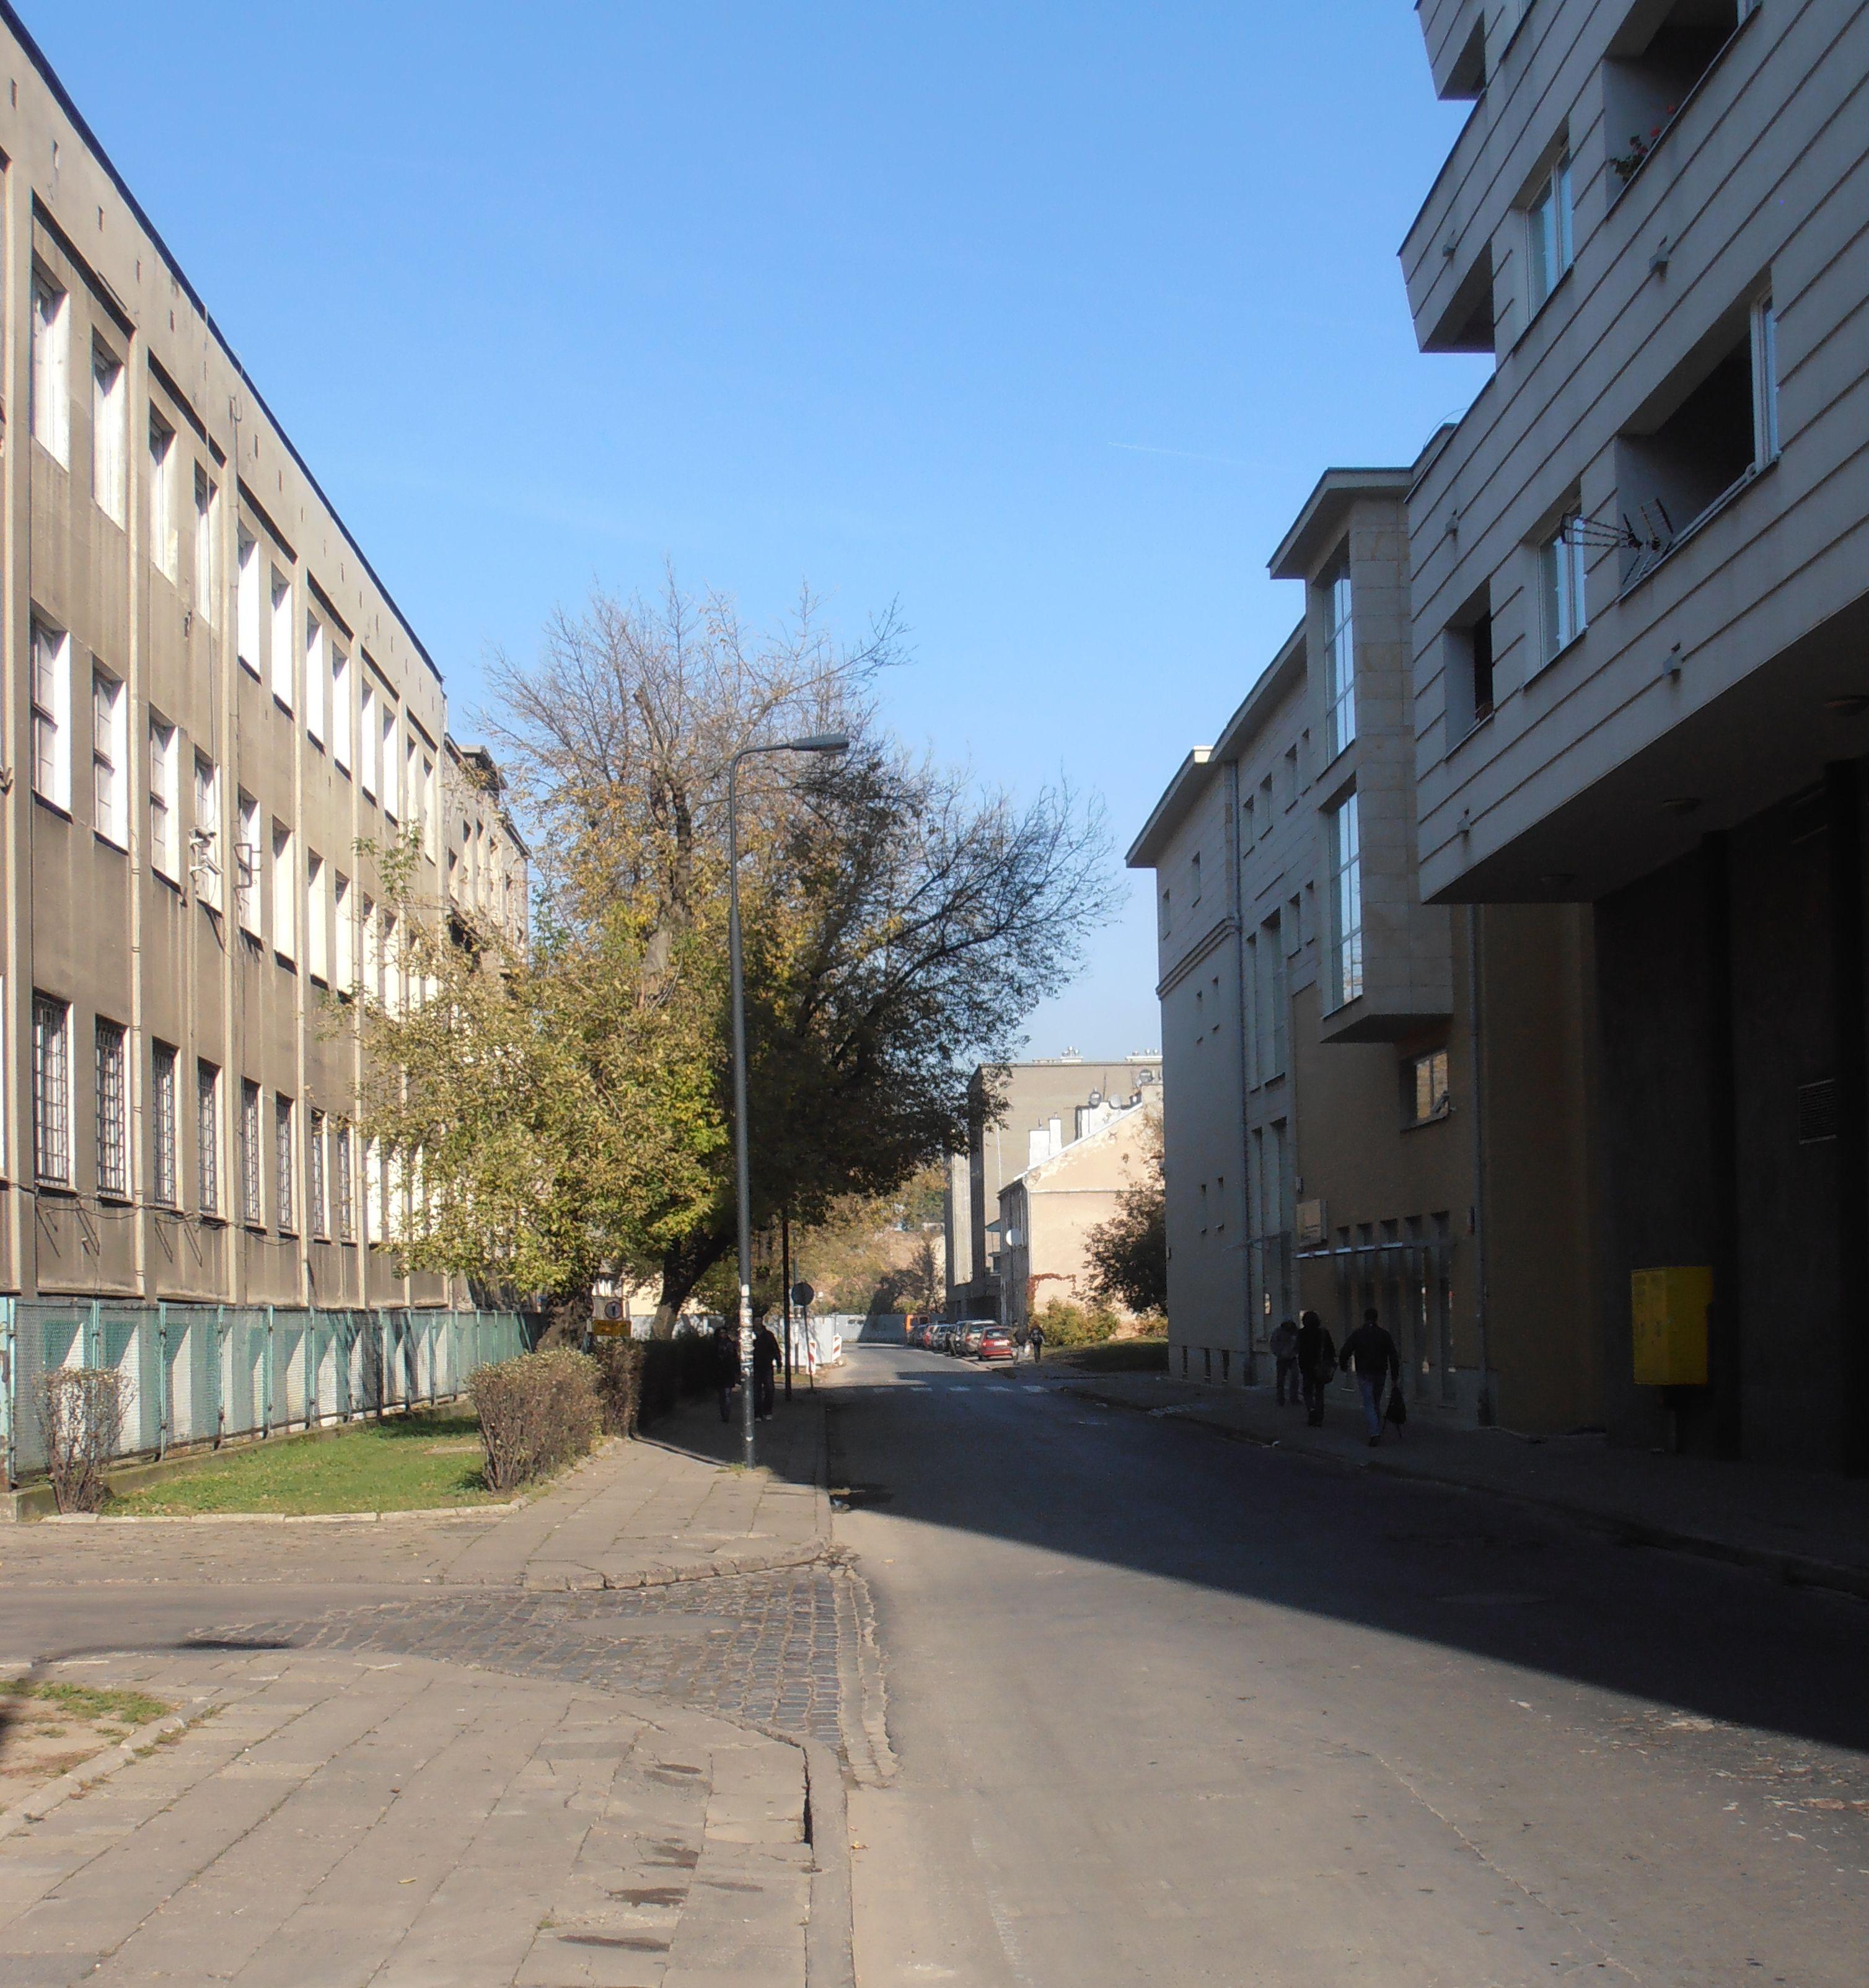 Ulica Gocławska